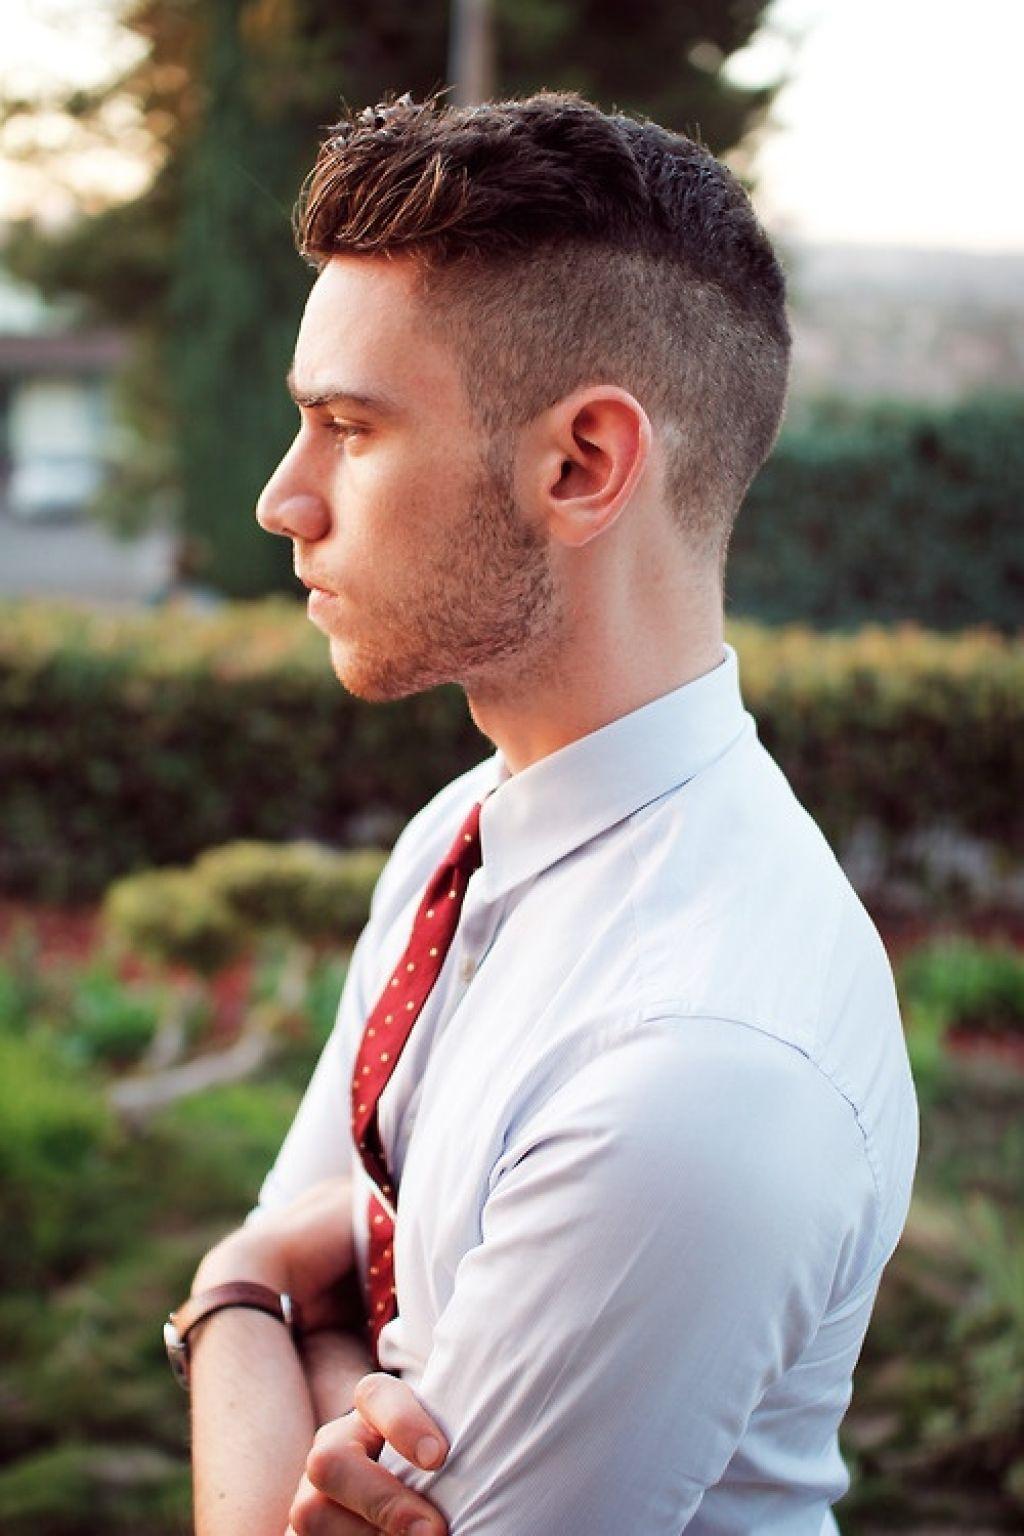 Top Hairstyle For Hispanic Men